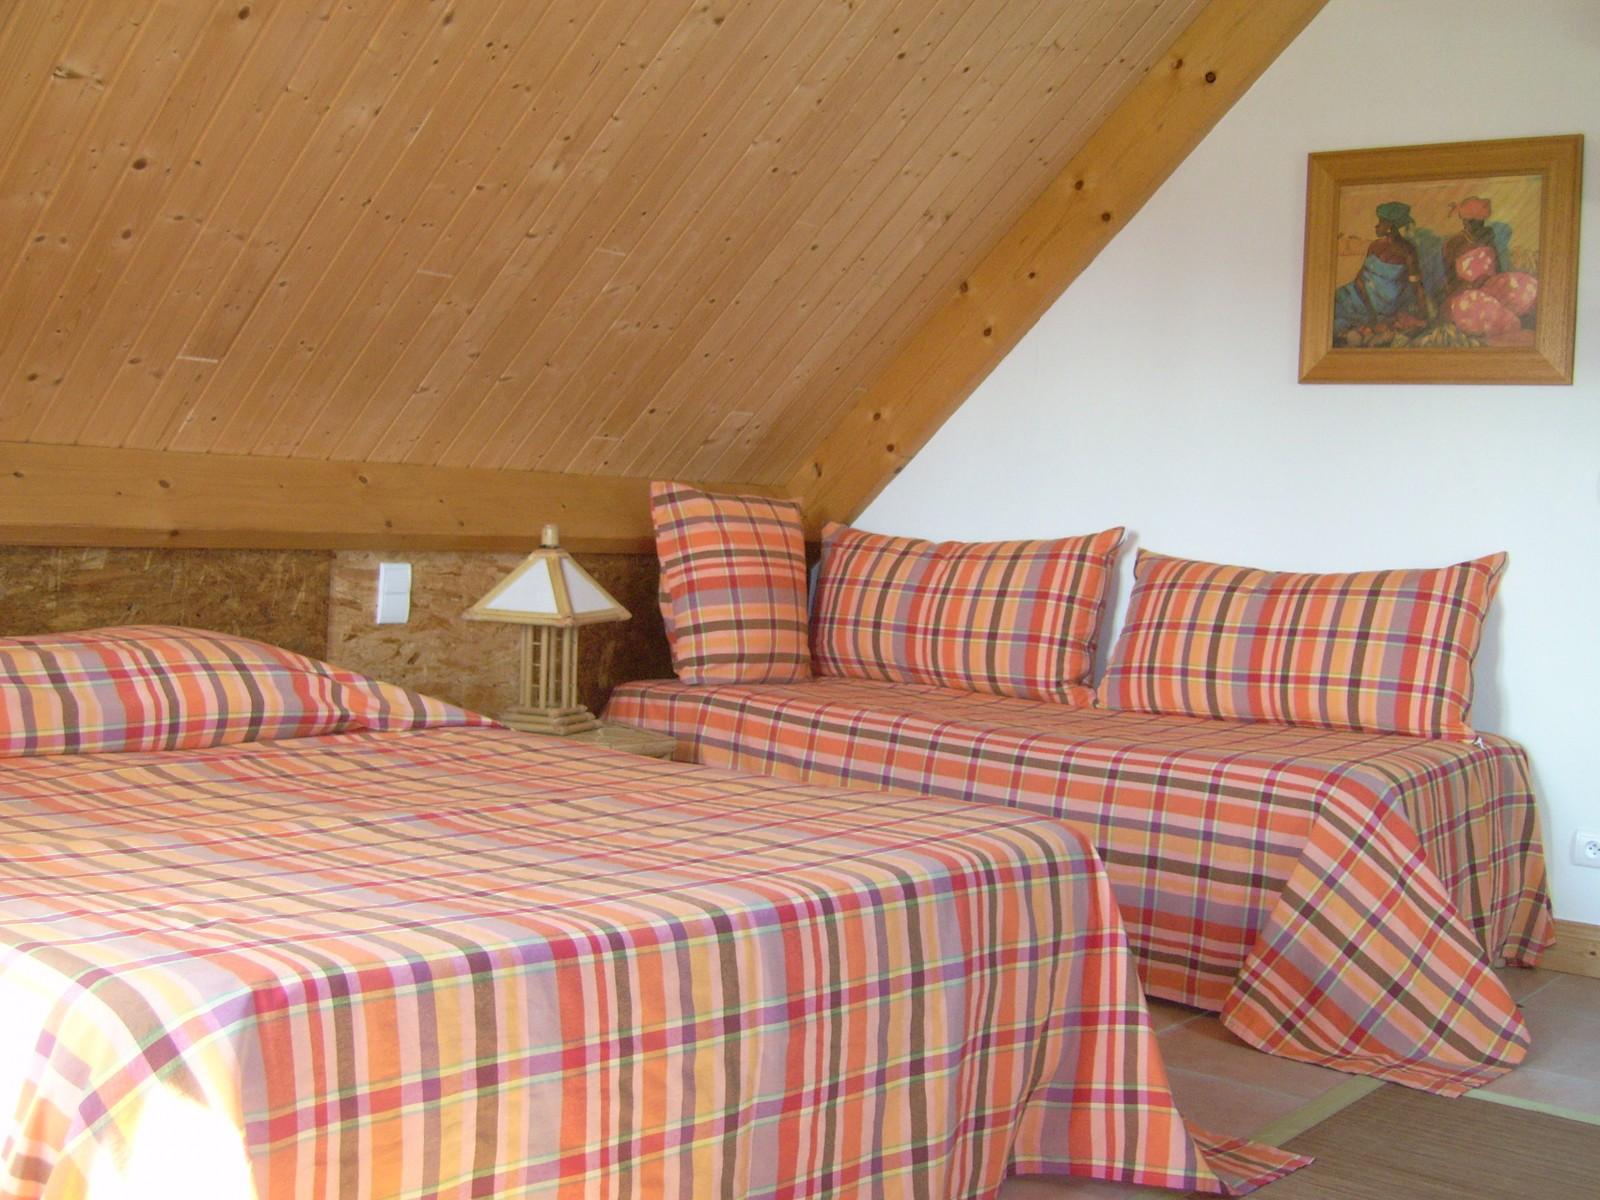 chambres d 39 h tes bangor belle le 11 personnes katy et. Black Bedroom Furniture Sets. Home Design Ideas